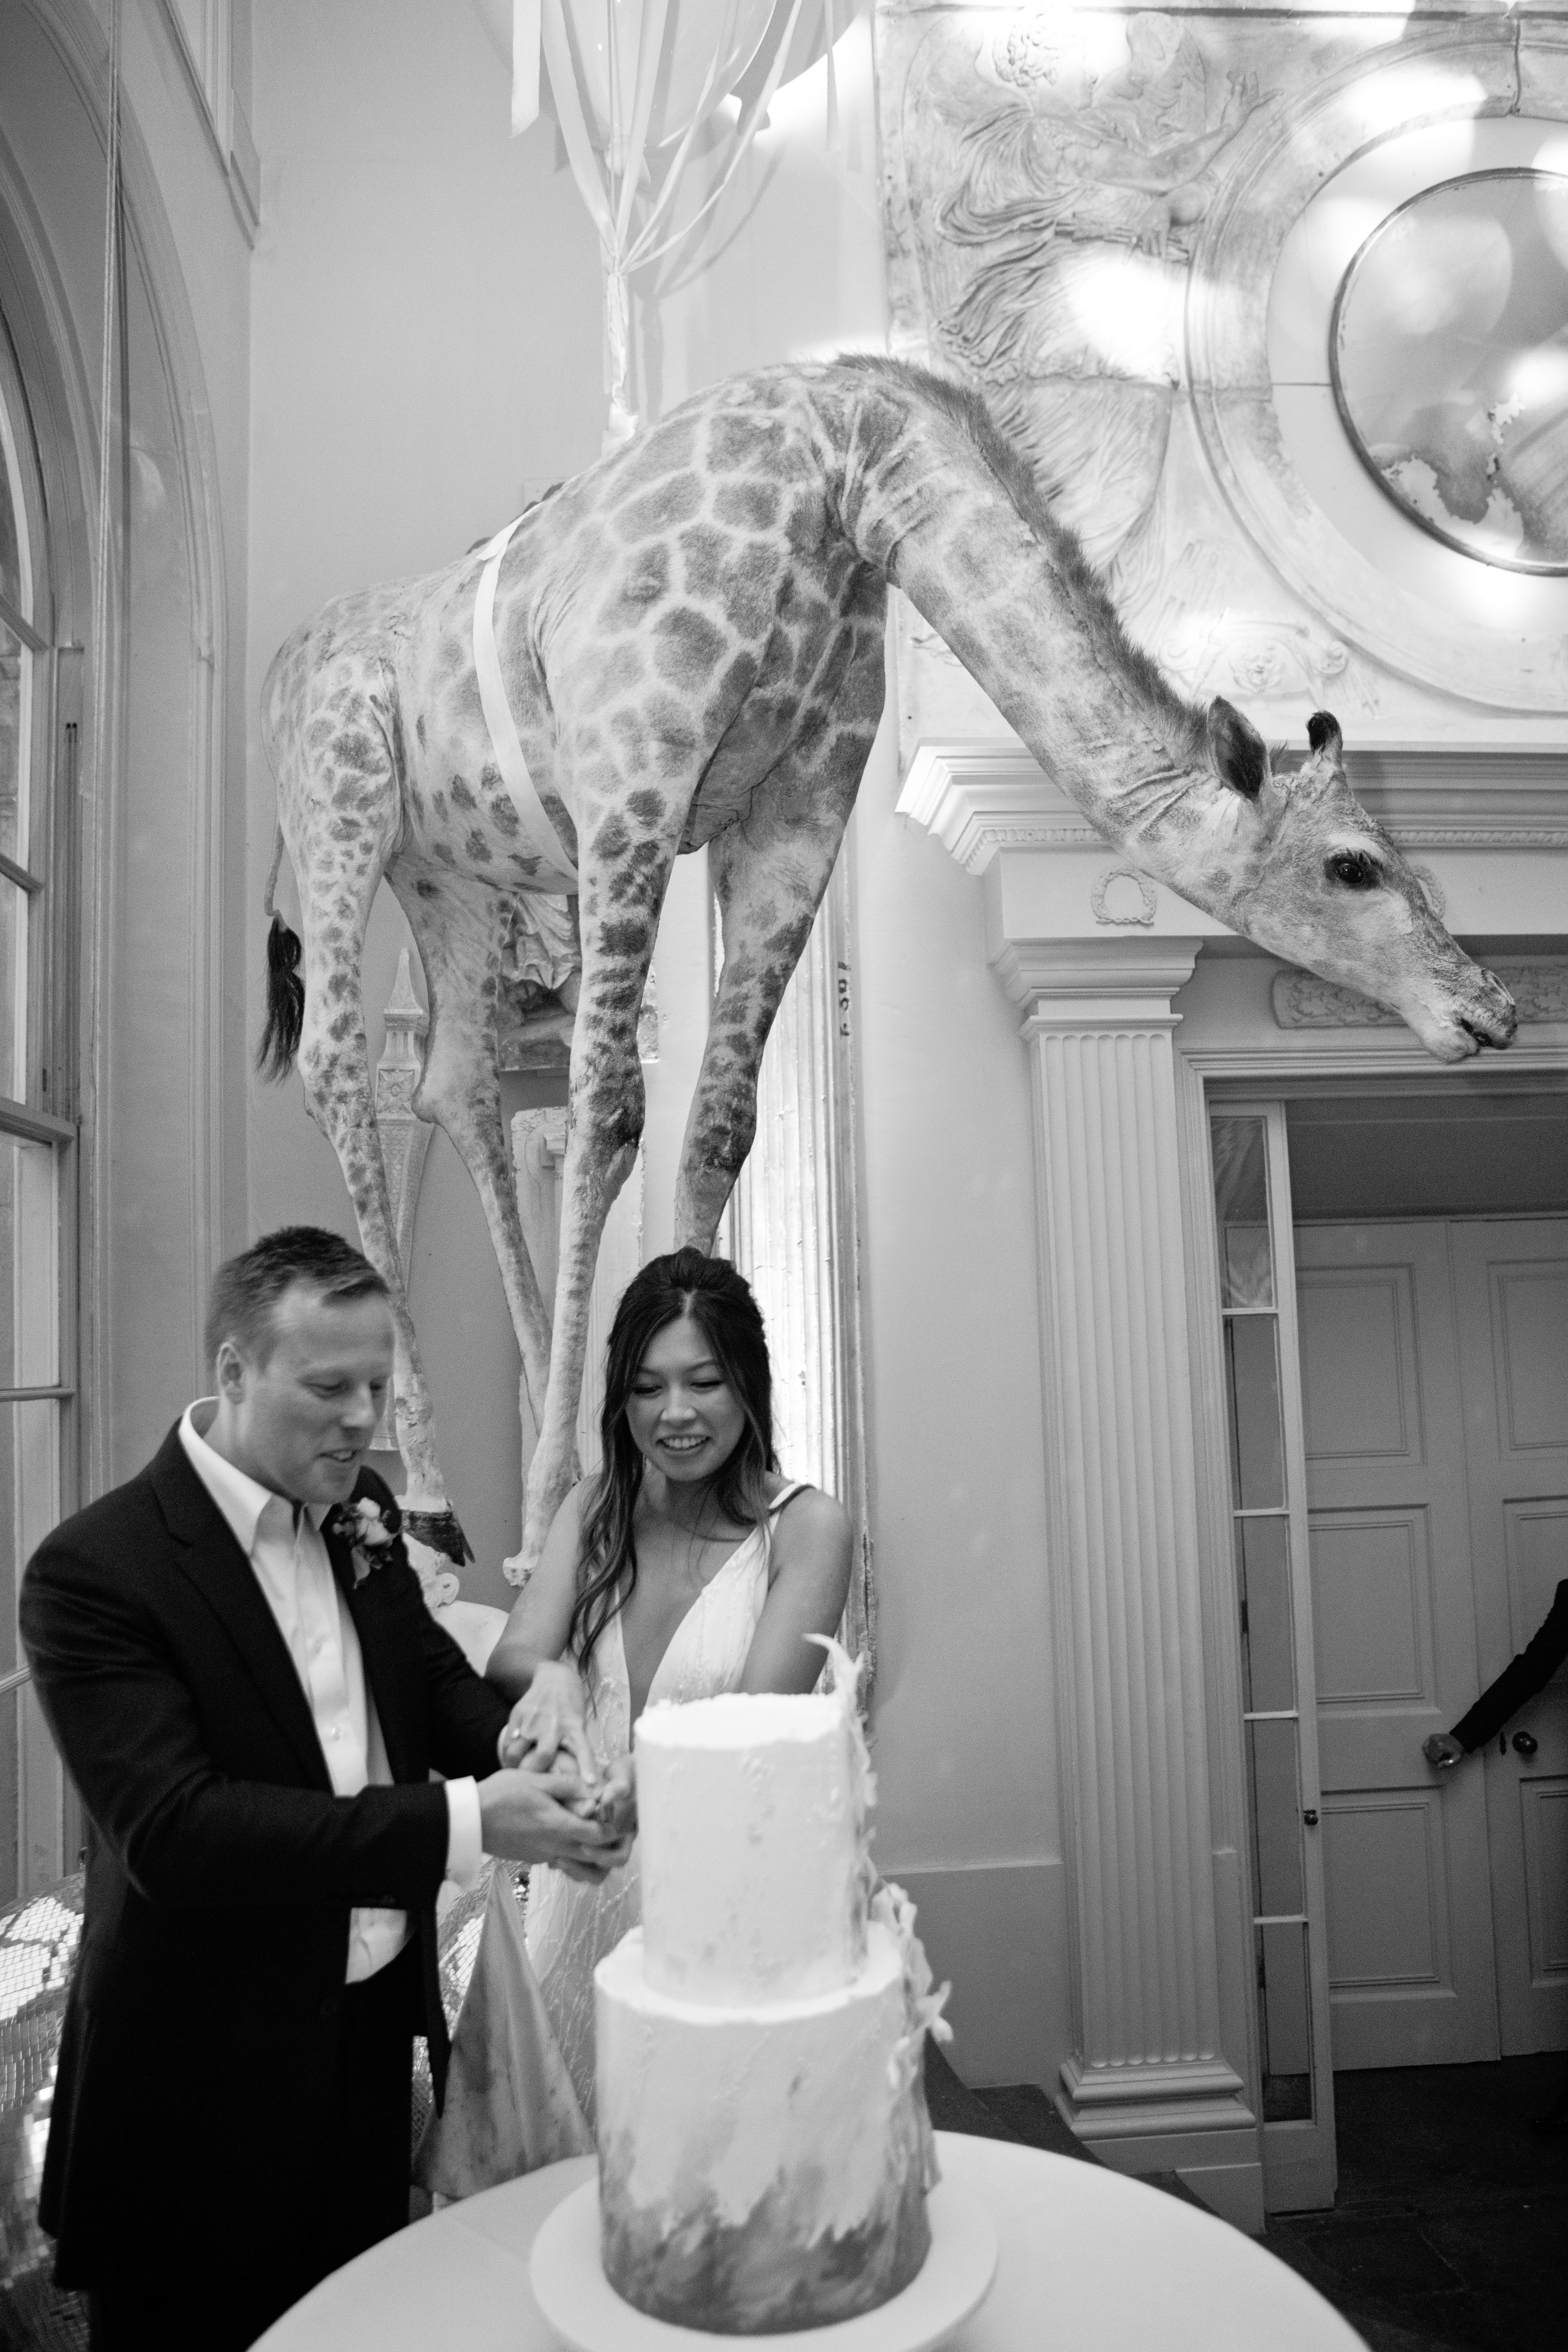 Oxford wedding at Aynhoe Park